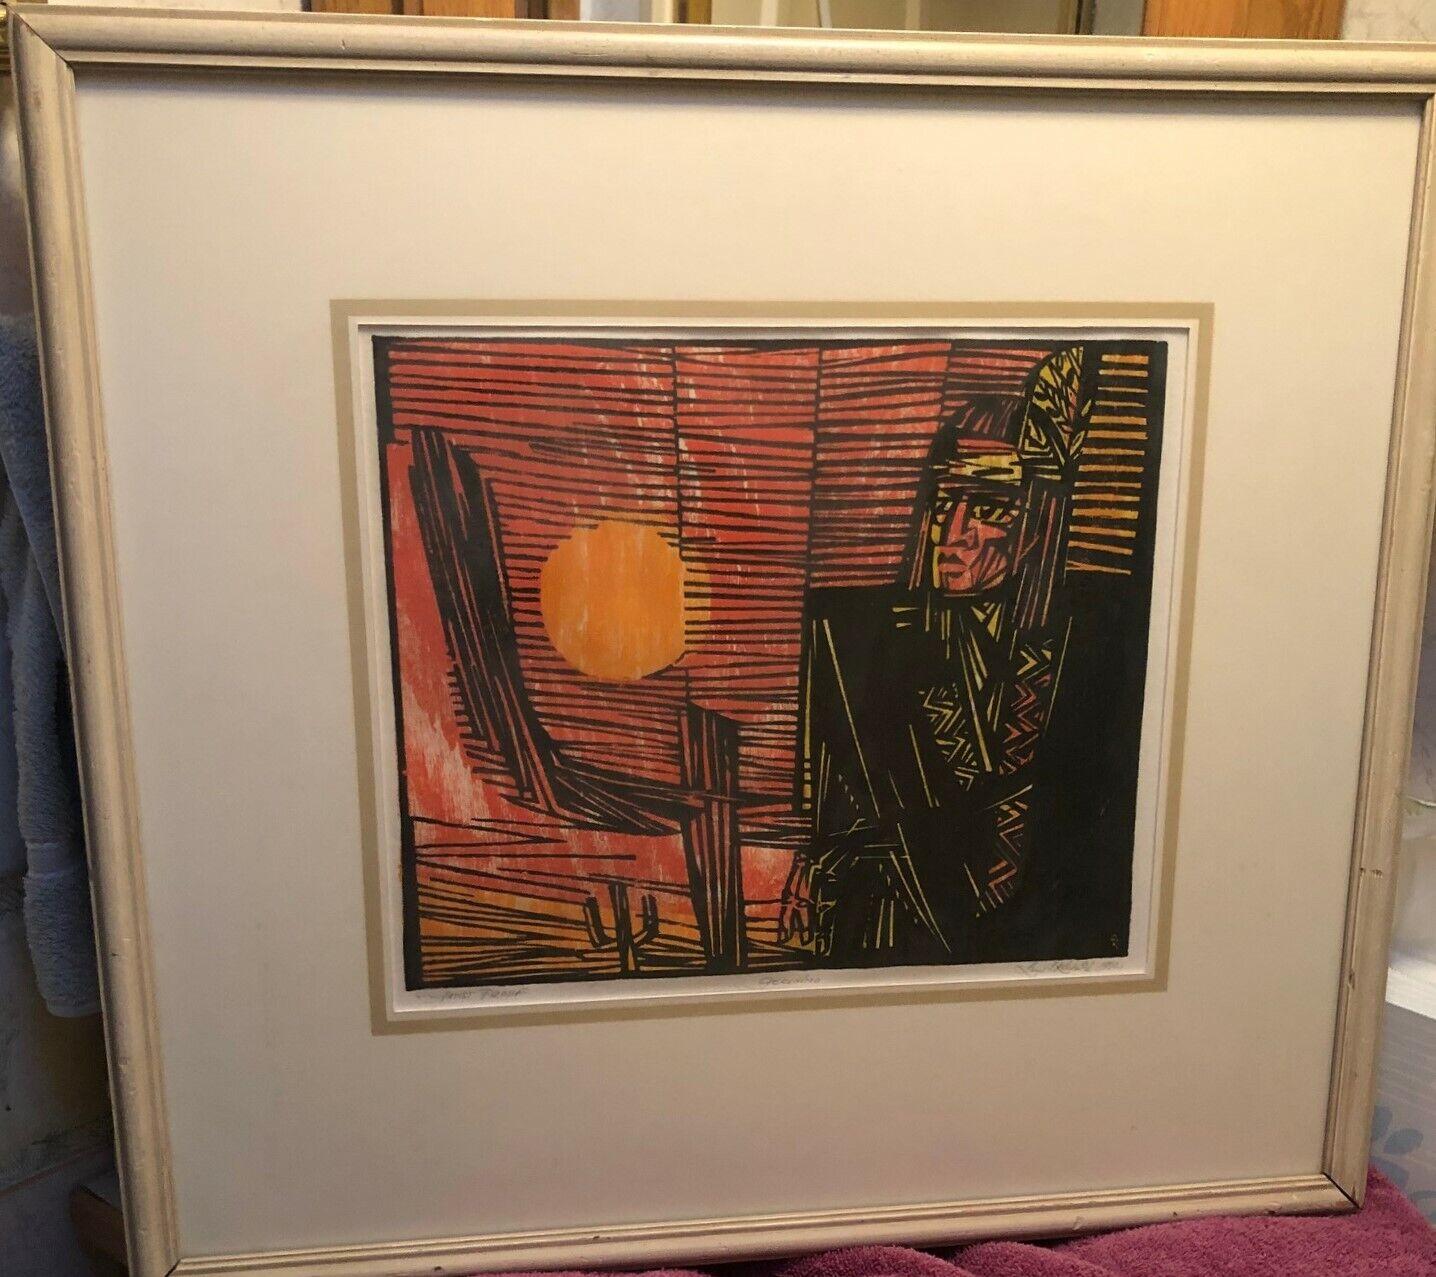 Geronimo An Original Oil Painting Woodcut By Leon Stanley Kawecki - $149.00